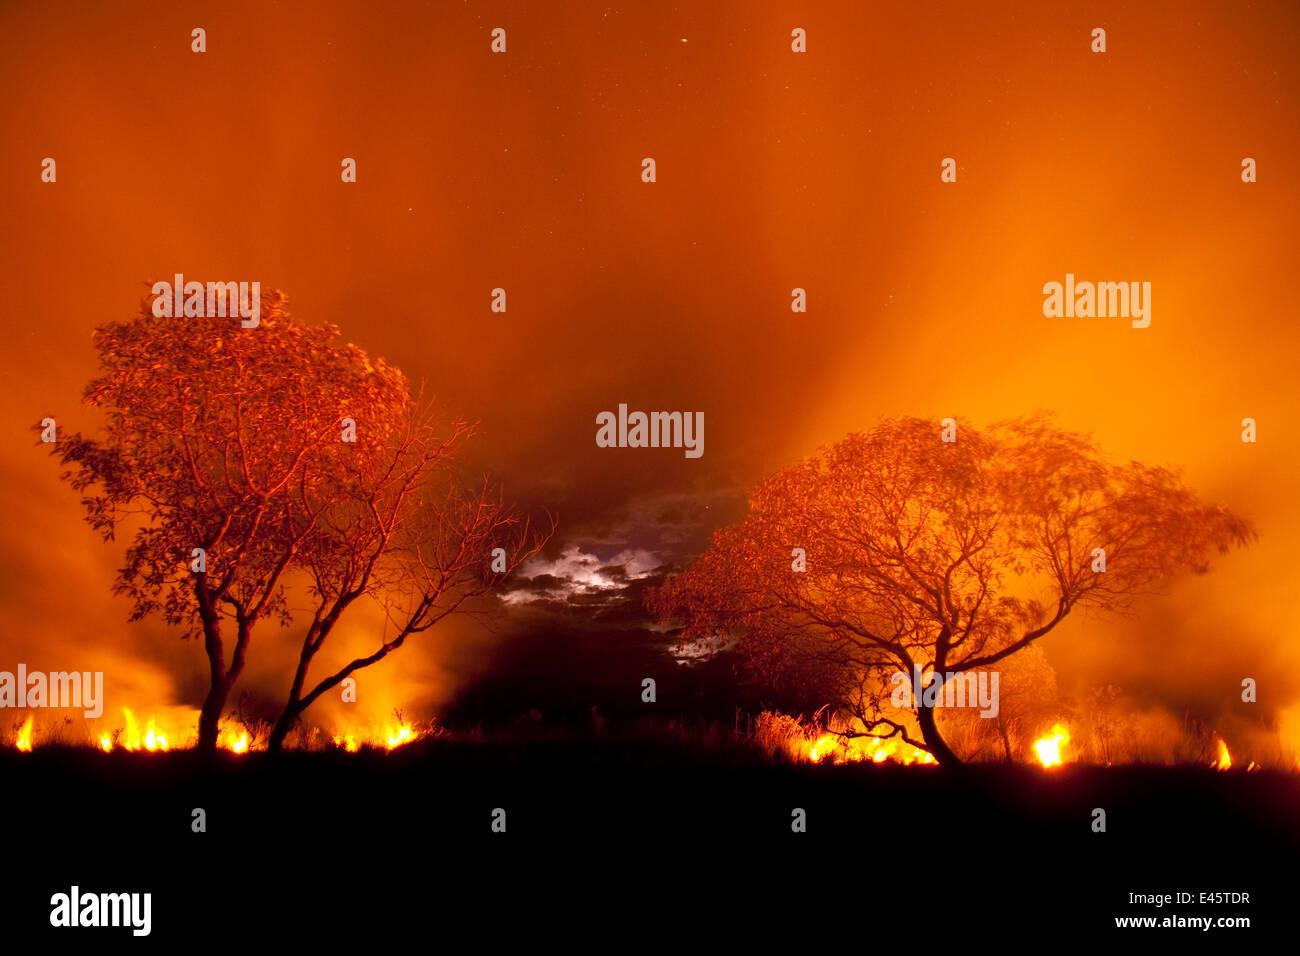 Fuoco d'erba di notte nel Pantanal, Brasile. Immagini Stock